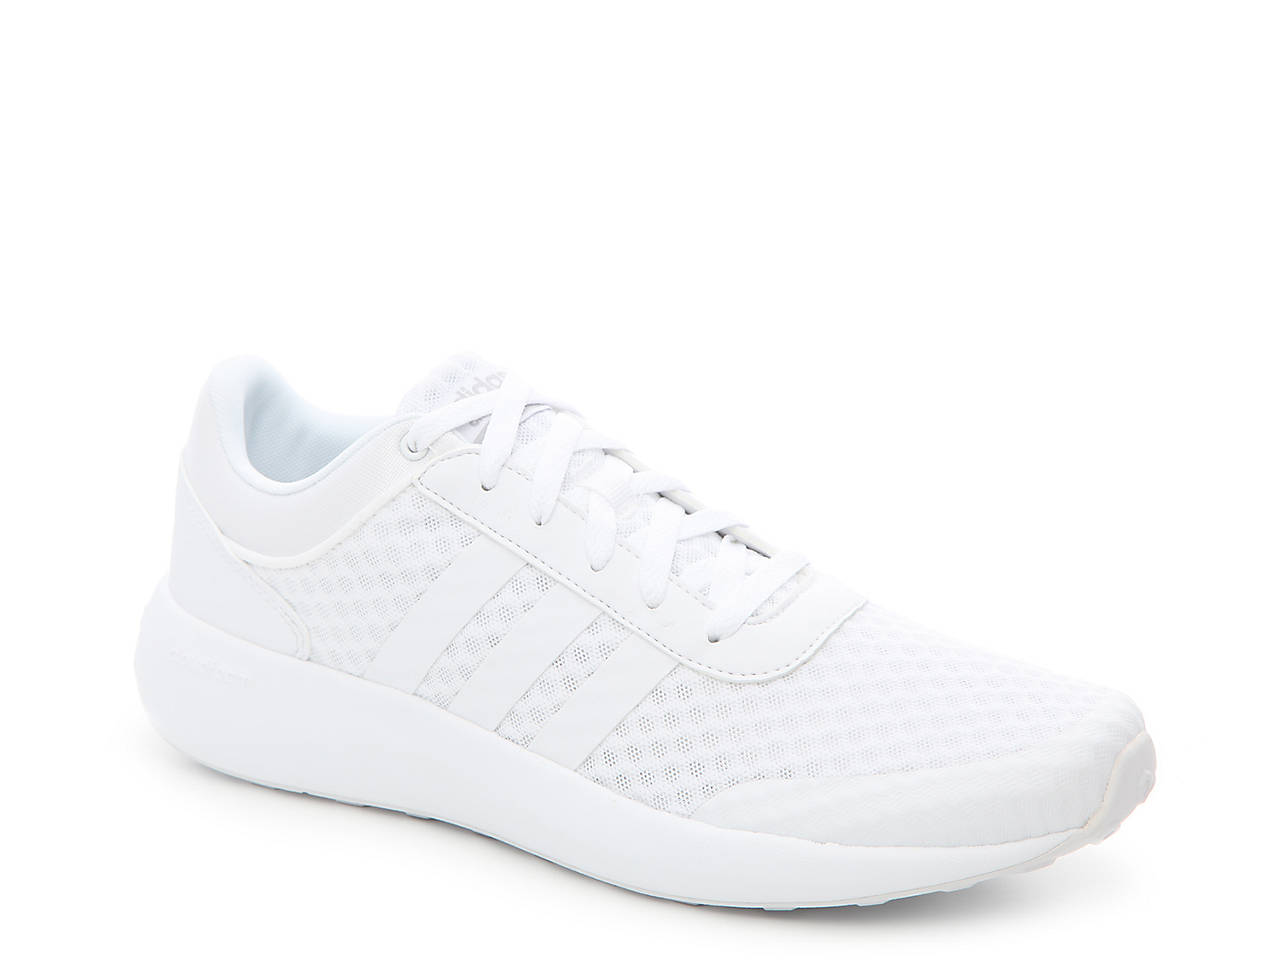 adidas NEO Cloudfoam Race Sneaker - Men s Men s Shoes  2ac5e7ded